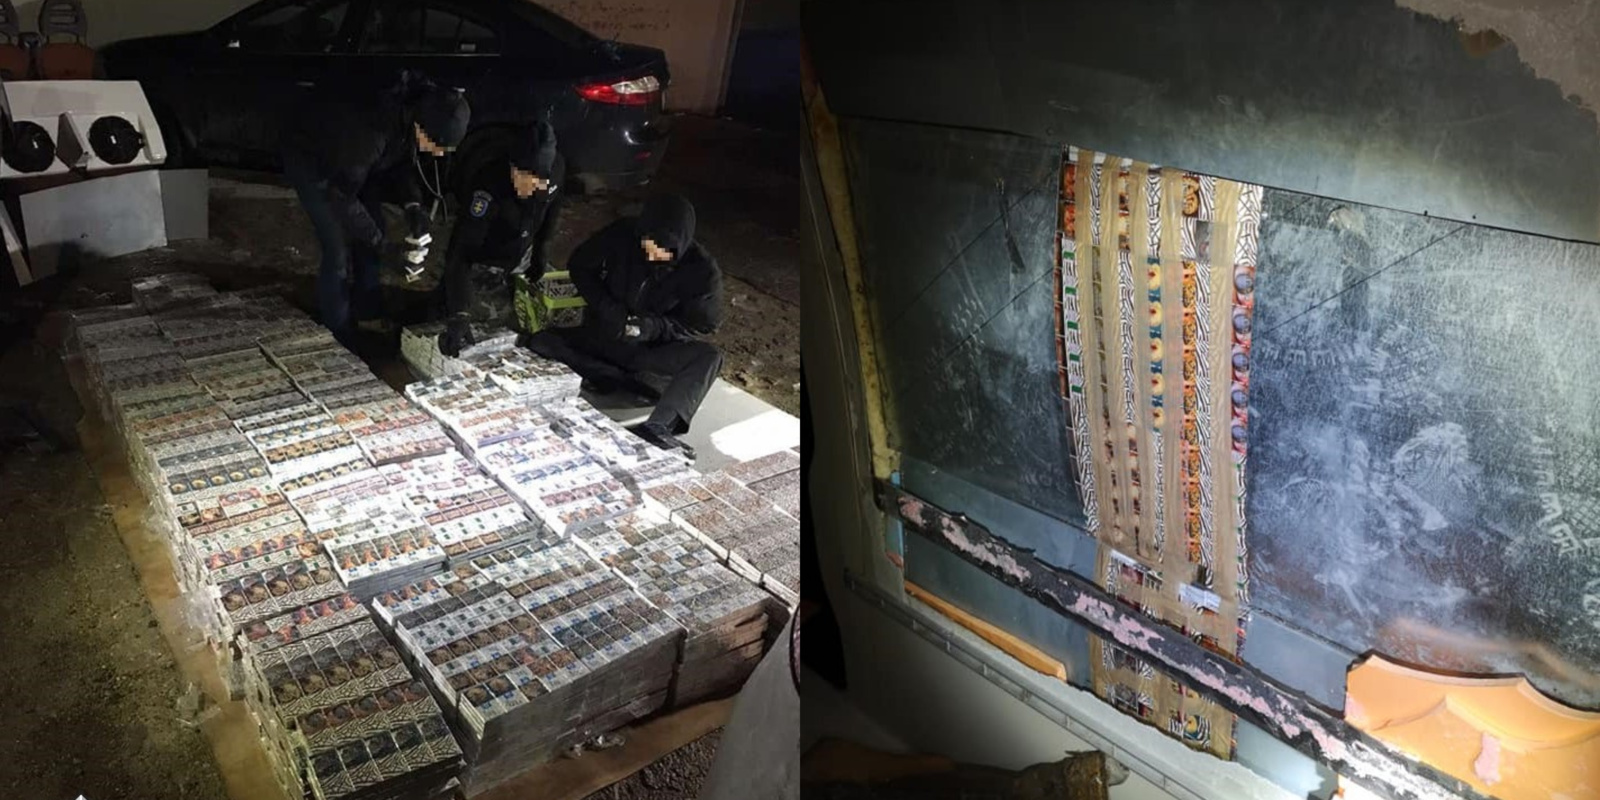 Kontrabandinės cigaretės slėptos ant vilkiko vežtame mikroautobuse-šaldytuve